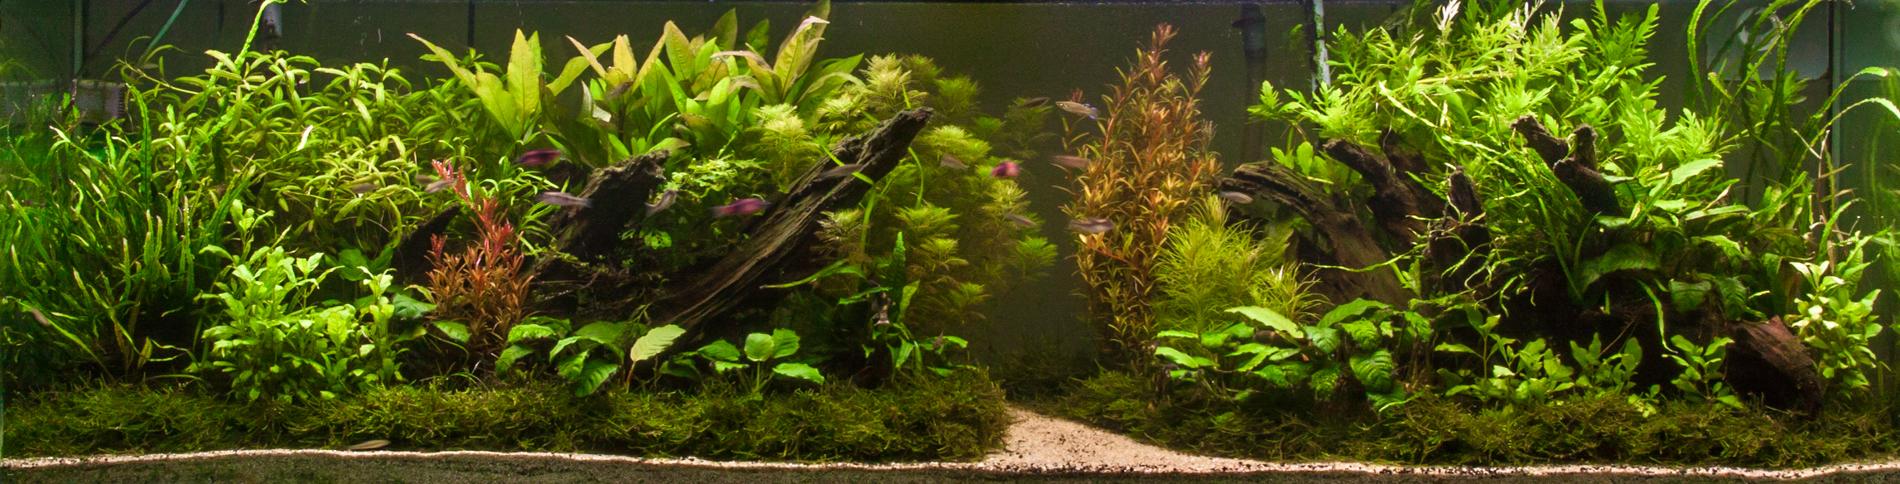 Taxiphyllum barbieri tank (1 of 1)-7.jpg